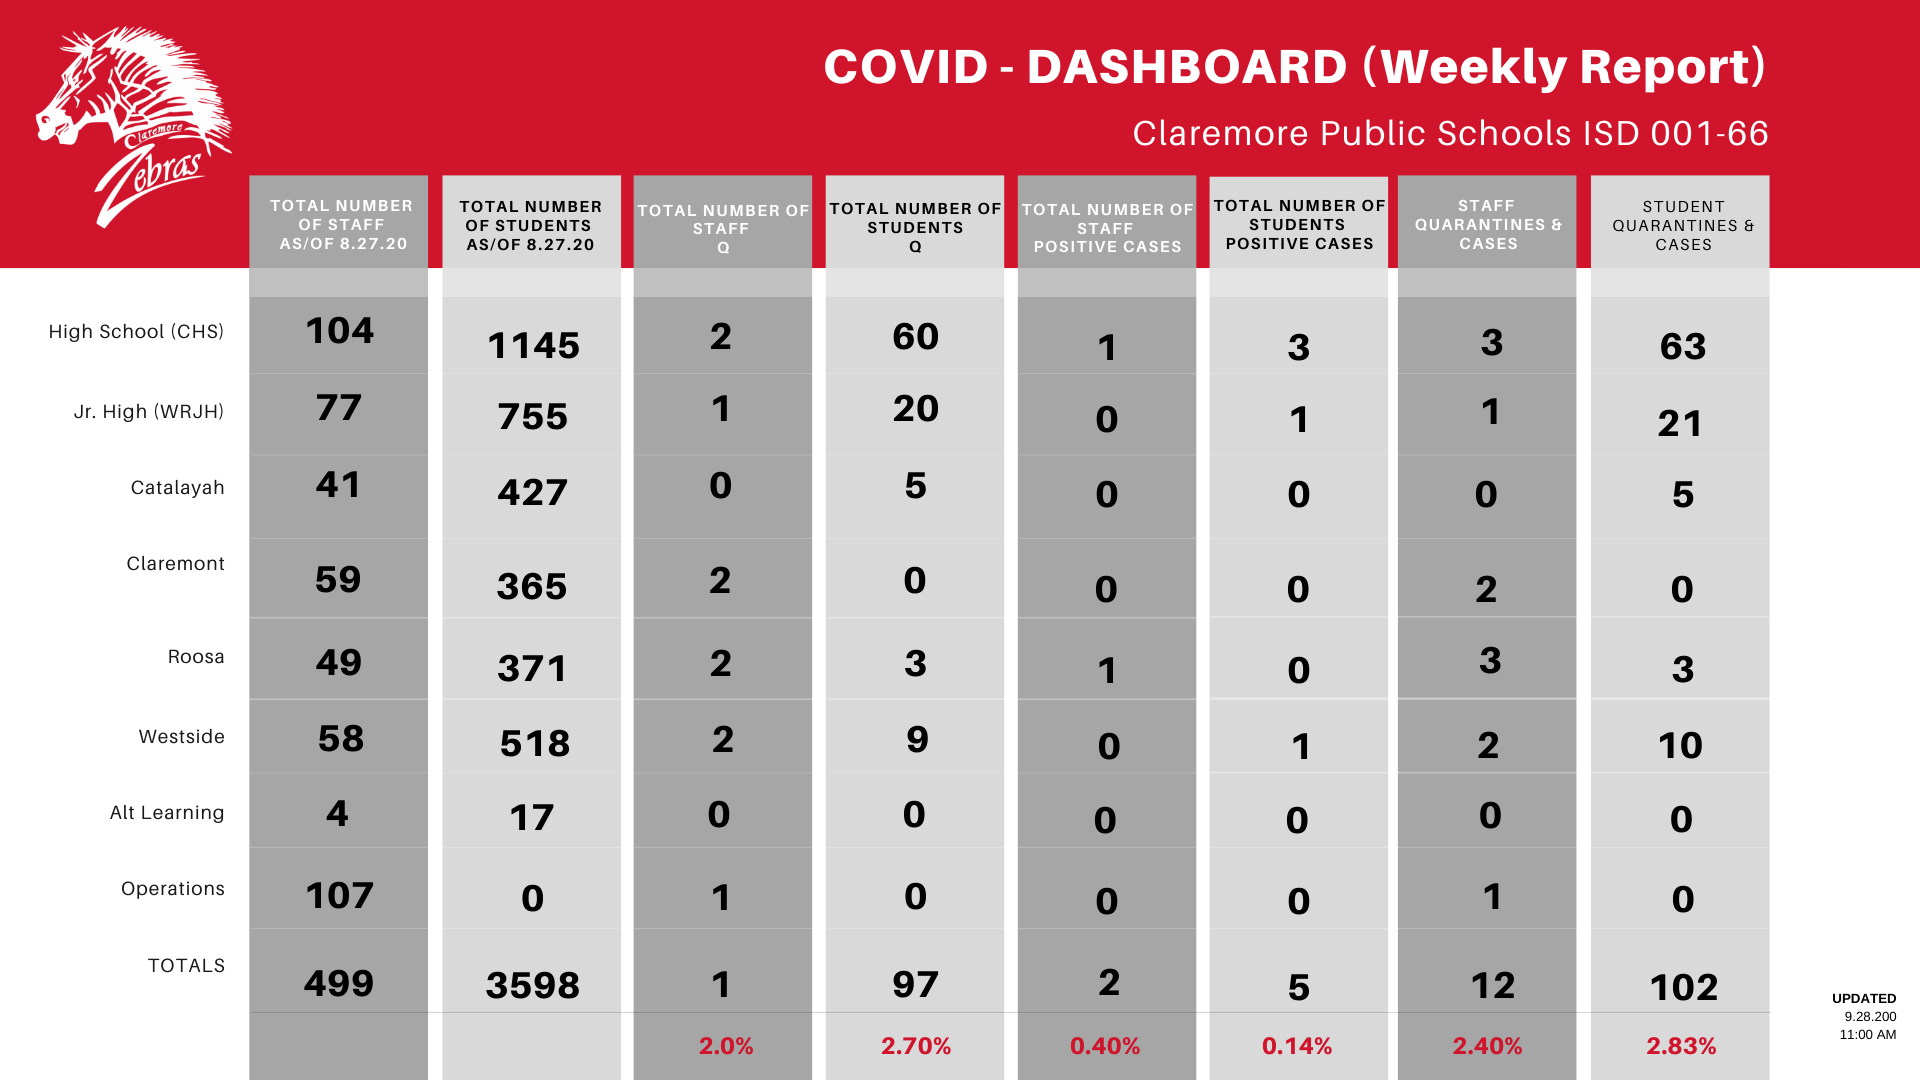 COVID DASHBOARD WEEKLY REPORT